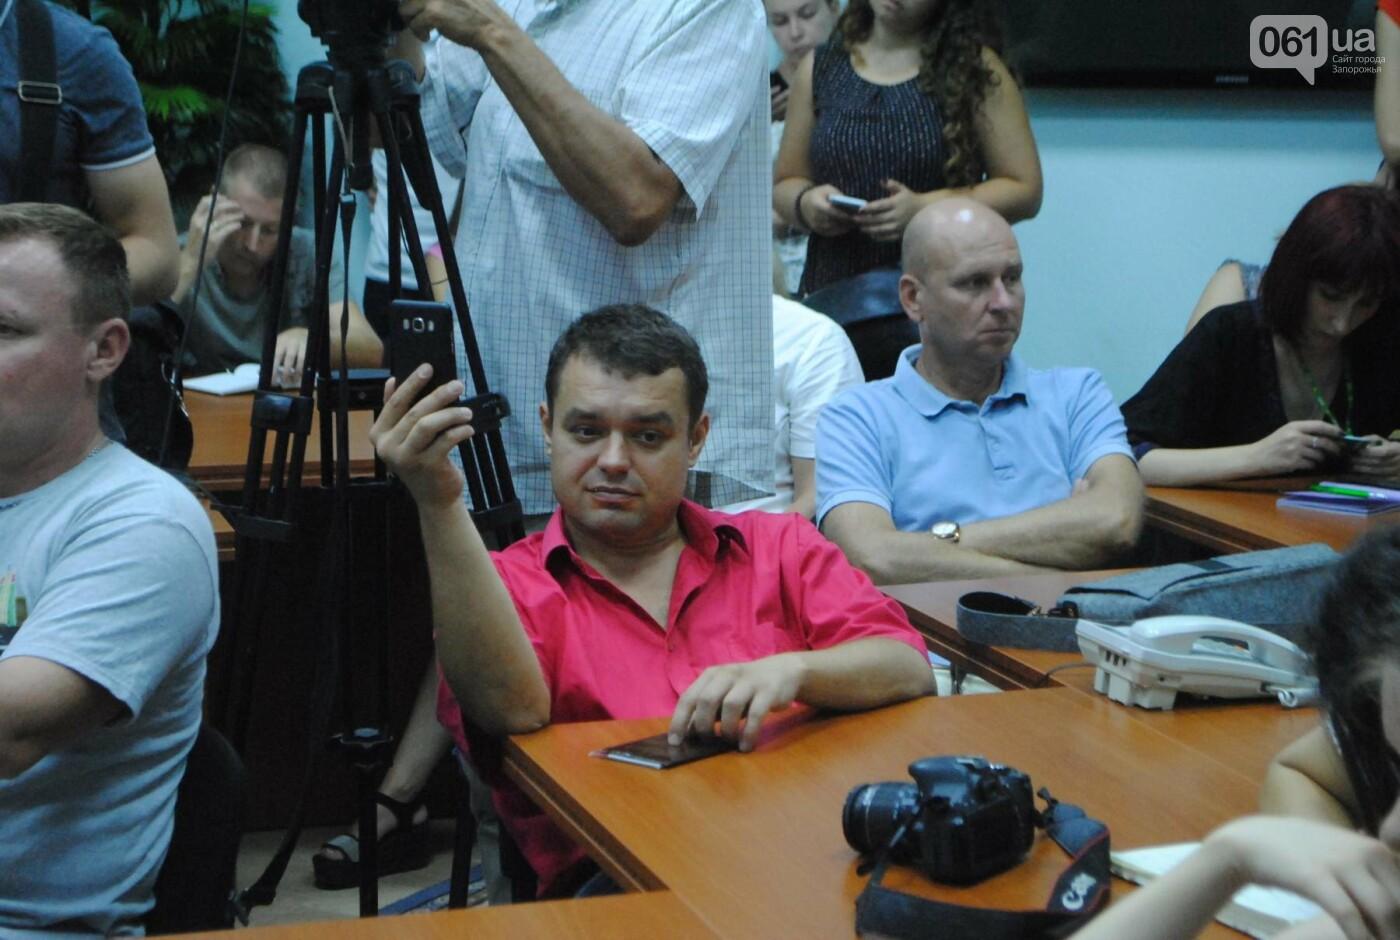 За Олешко следили два дня: в полиции рассказали подробности покушения в Бердянске, - ФОТО, фото-10